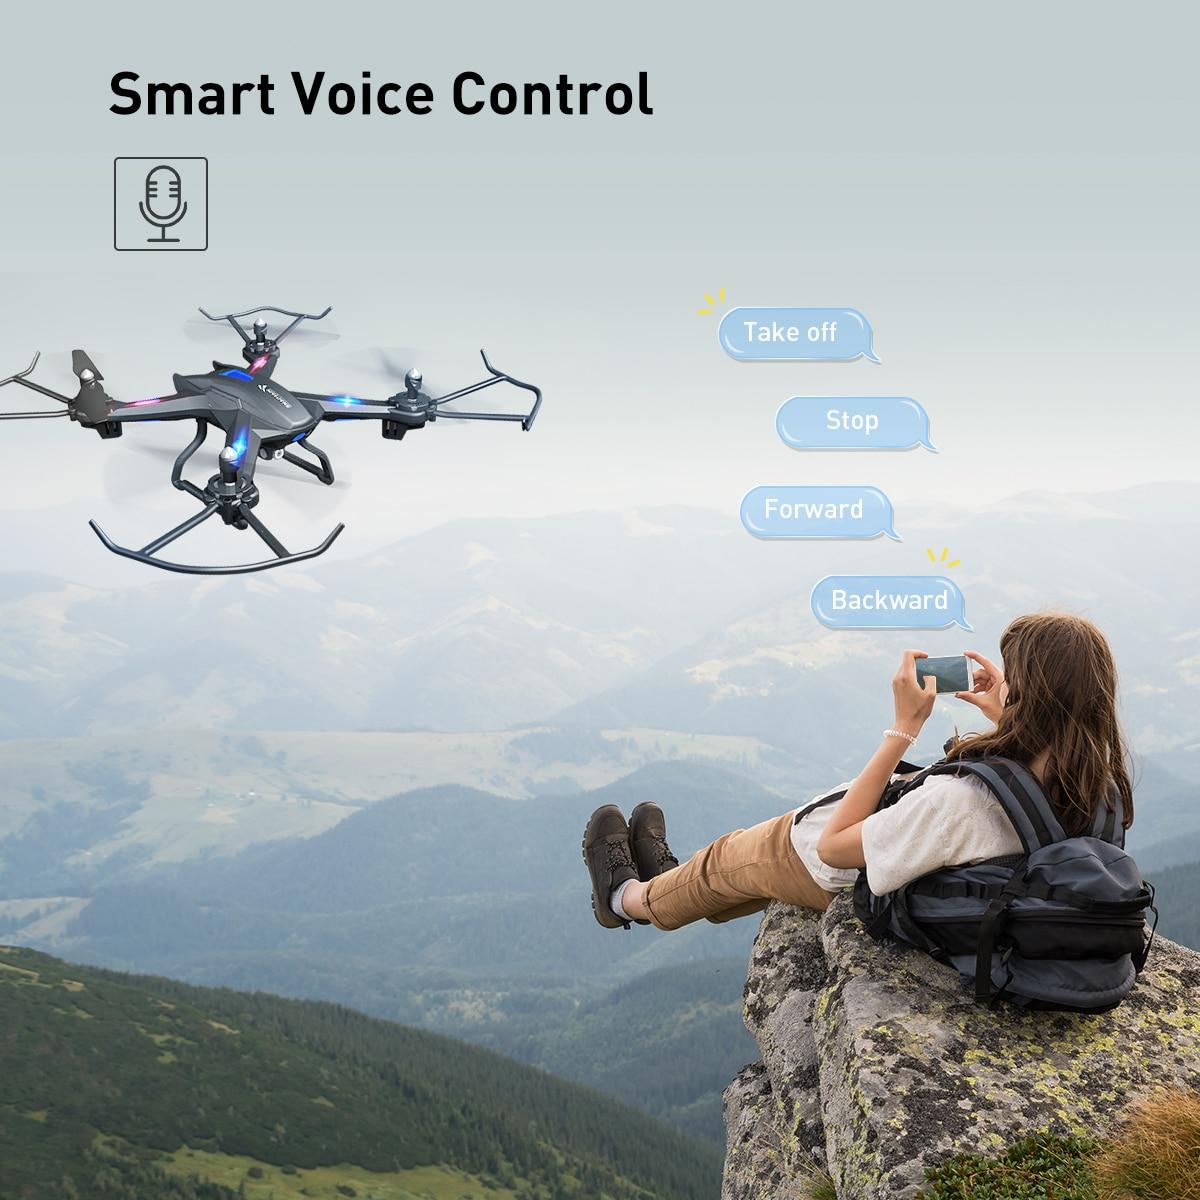 SNAPTAIN S5C Drone WiFi FPV 1080P HD camera drone Voice control Gravity Sensor drone profissional Foldable Quadcopter RC Dron enlarge